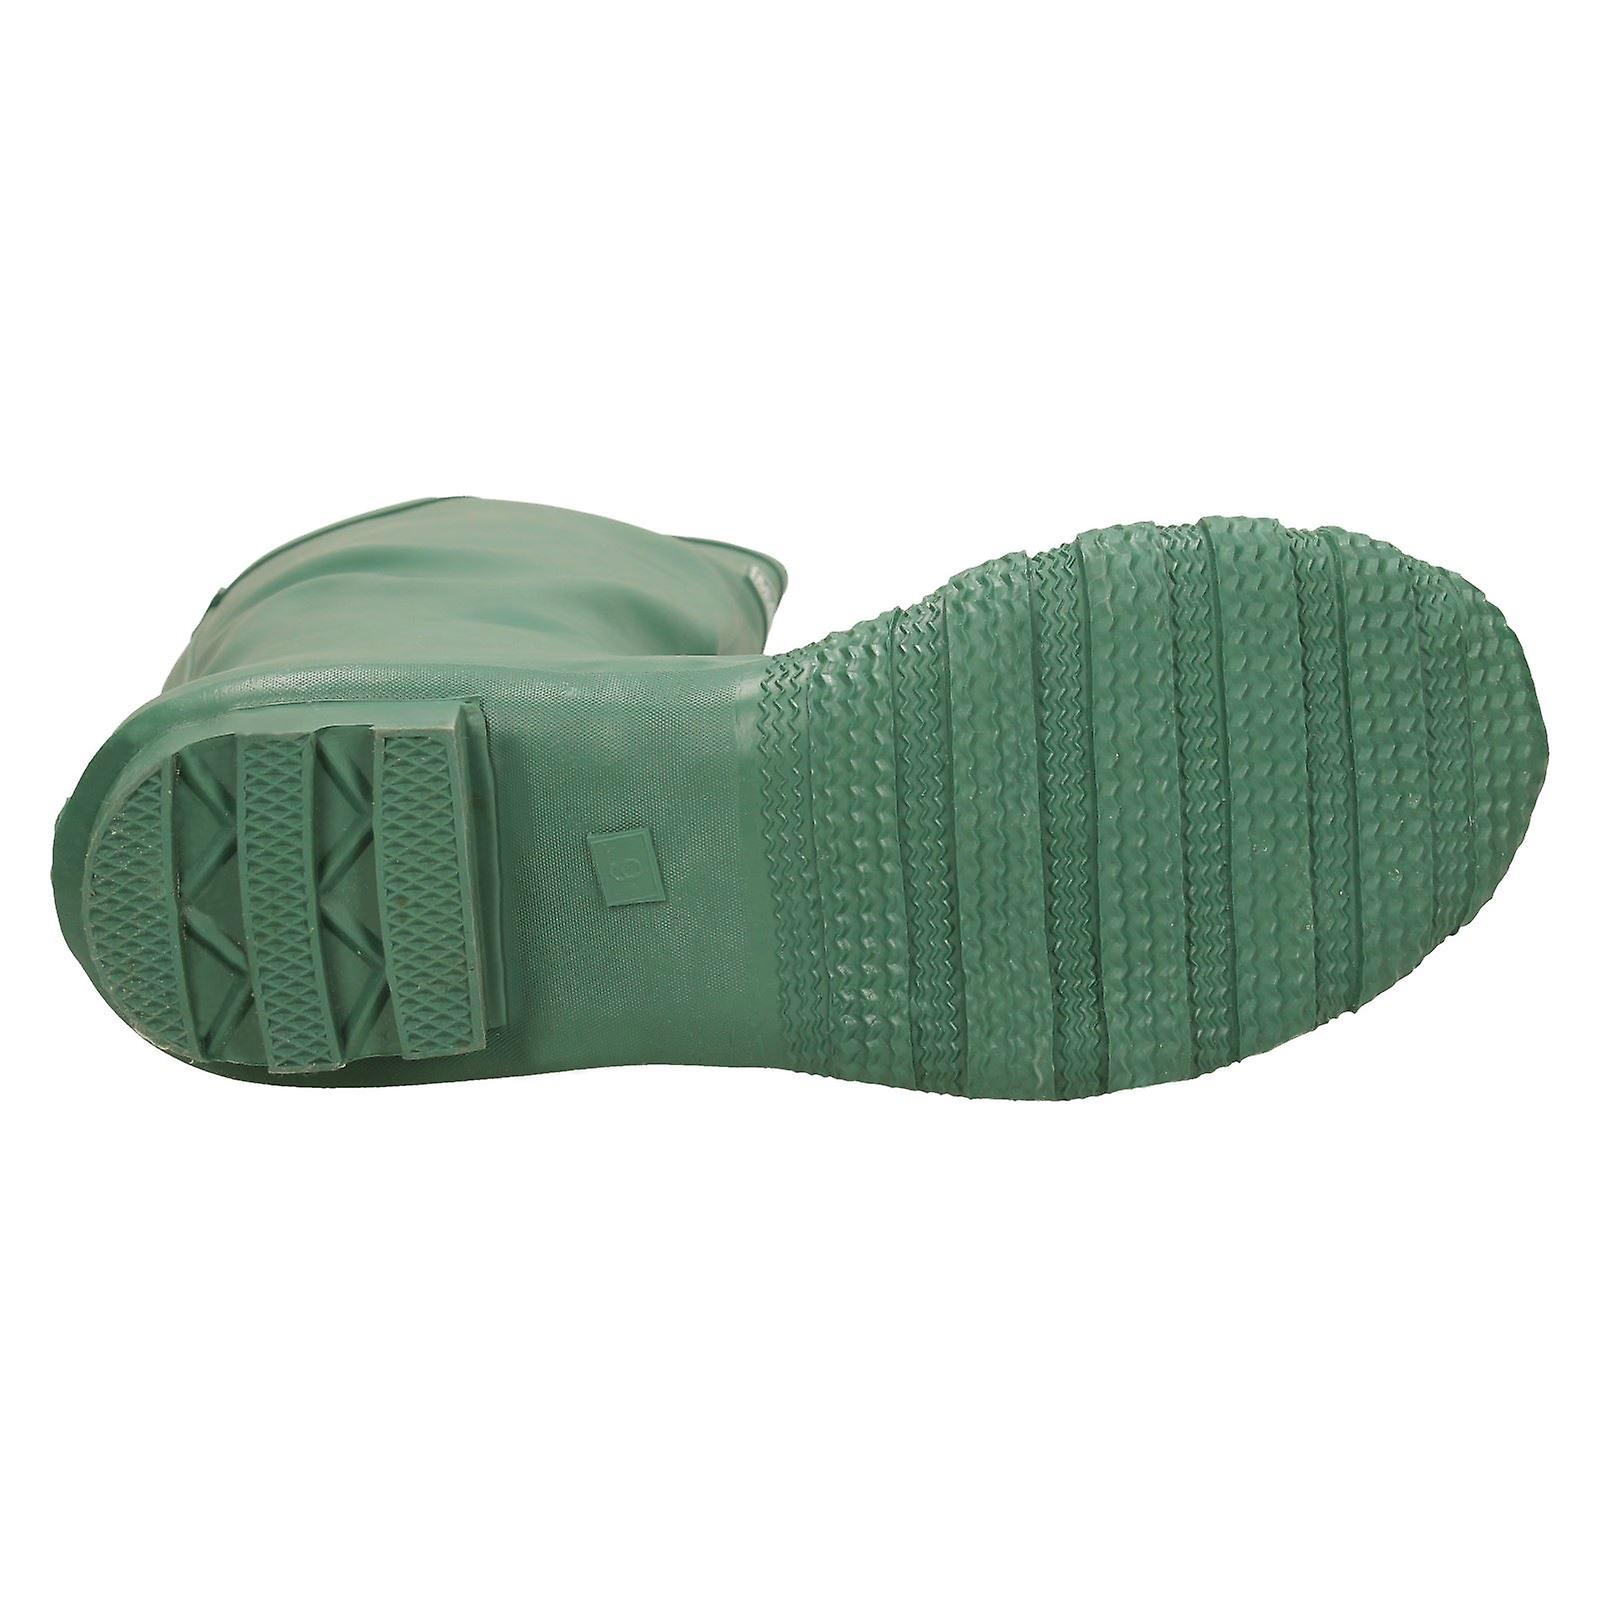 Herre Malvern gummistøvler